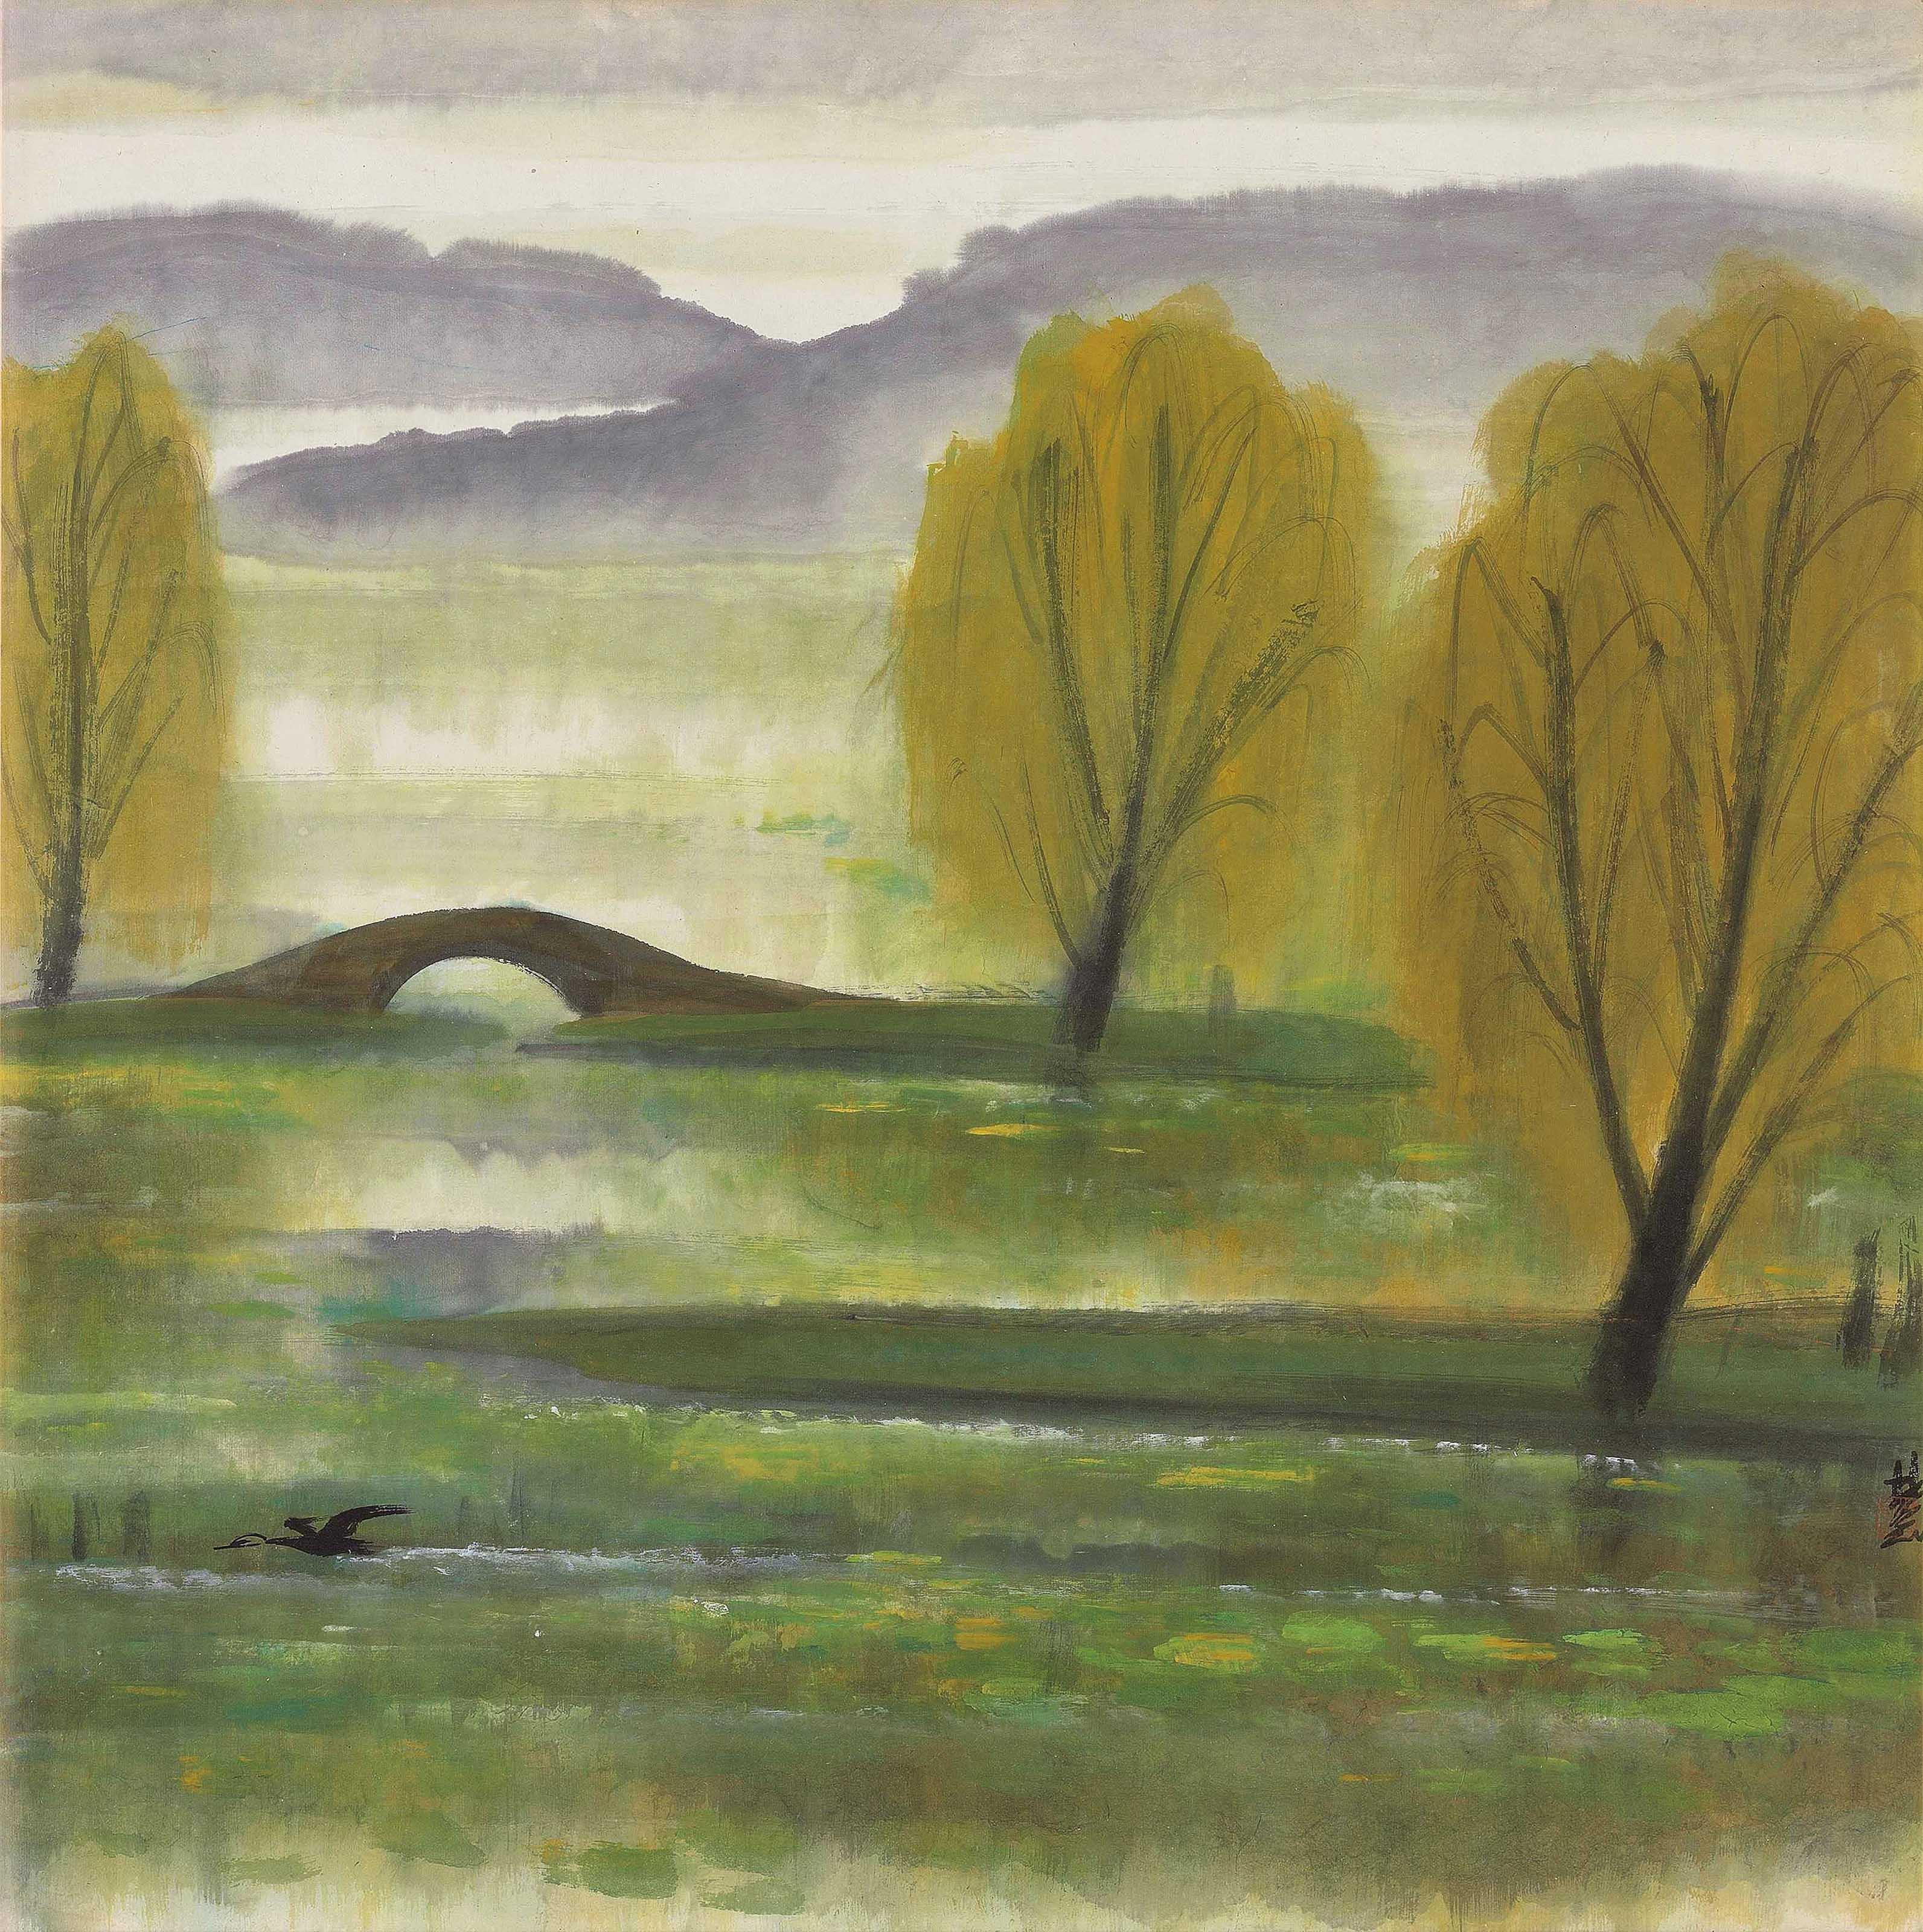 LIN FENGMIAN (CHINA, 1900-1991)